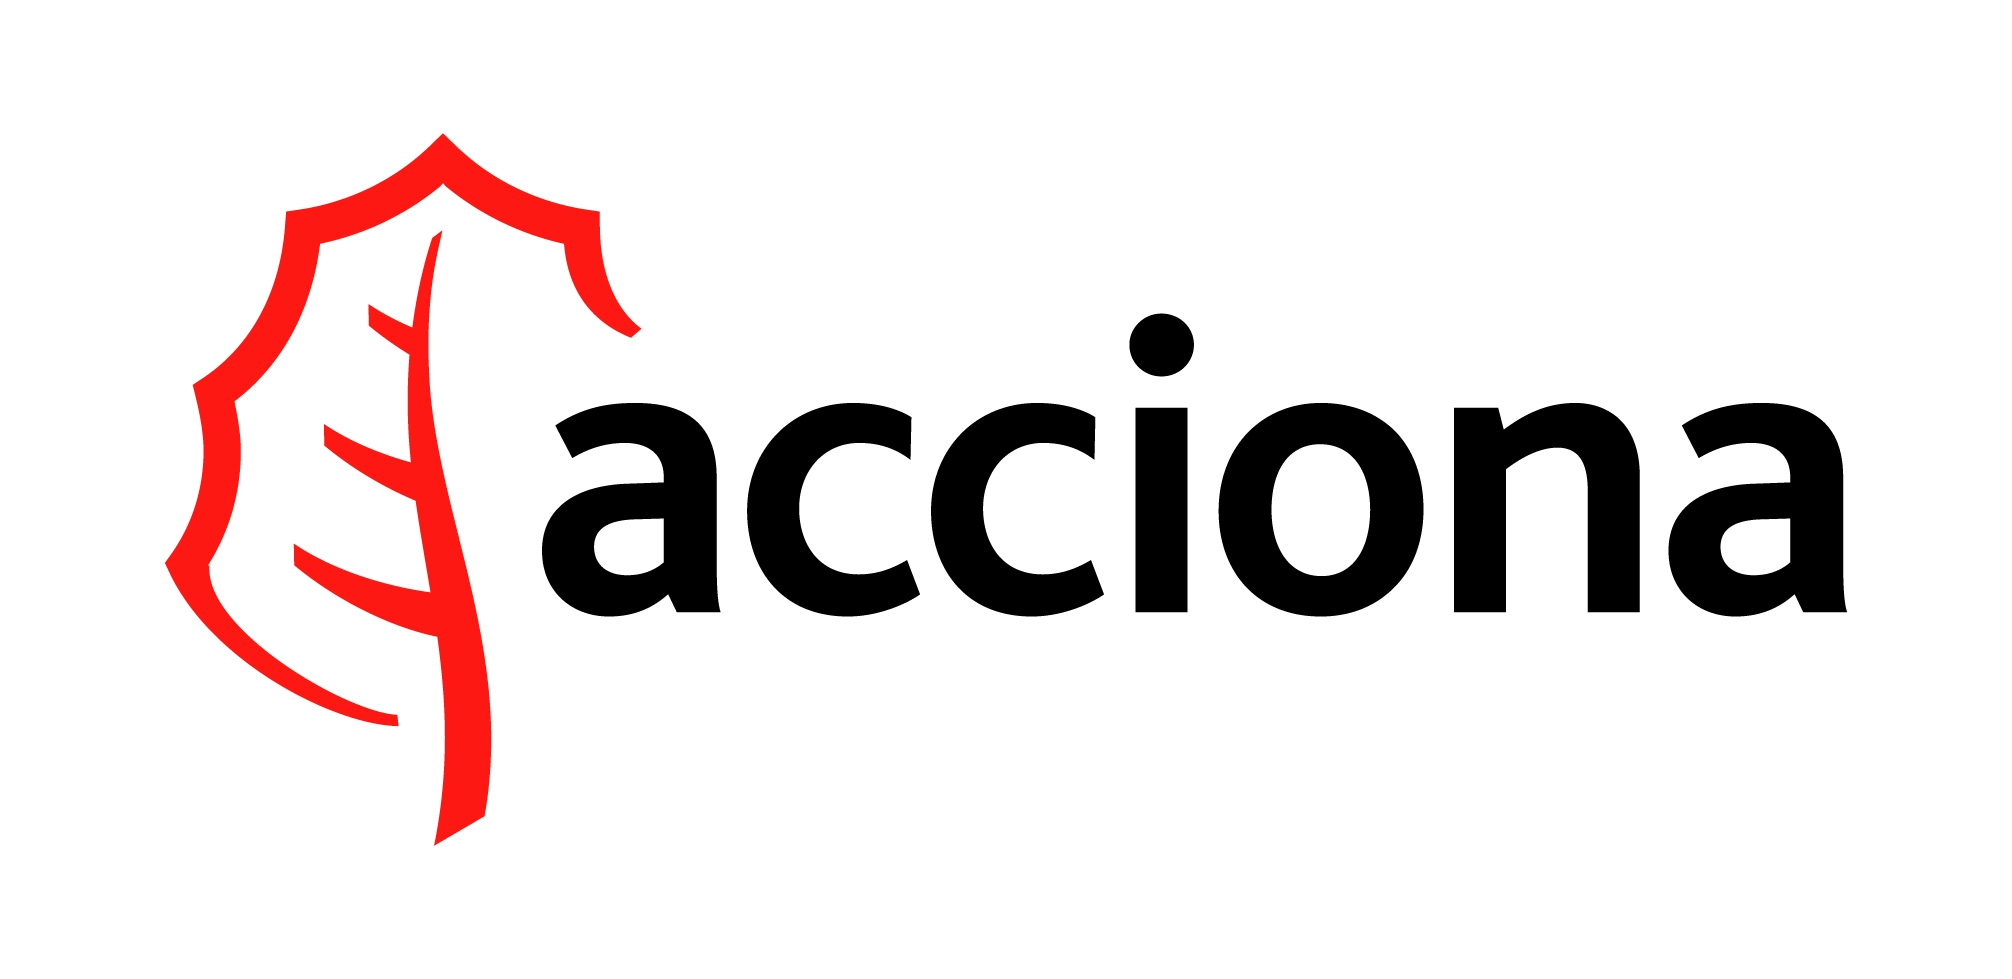 Acciona Logo Wallpaper